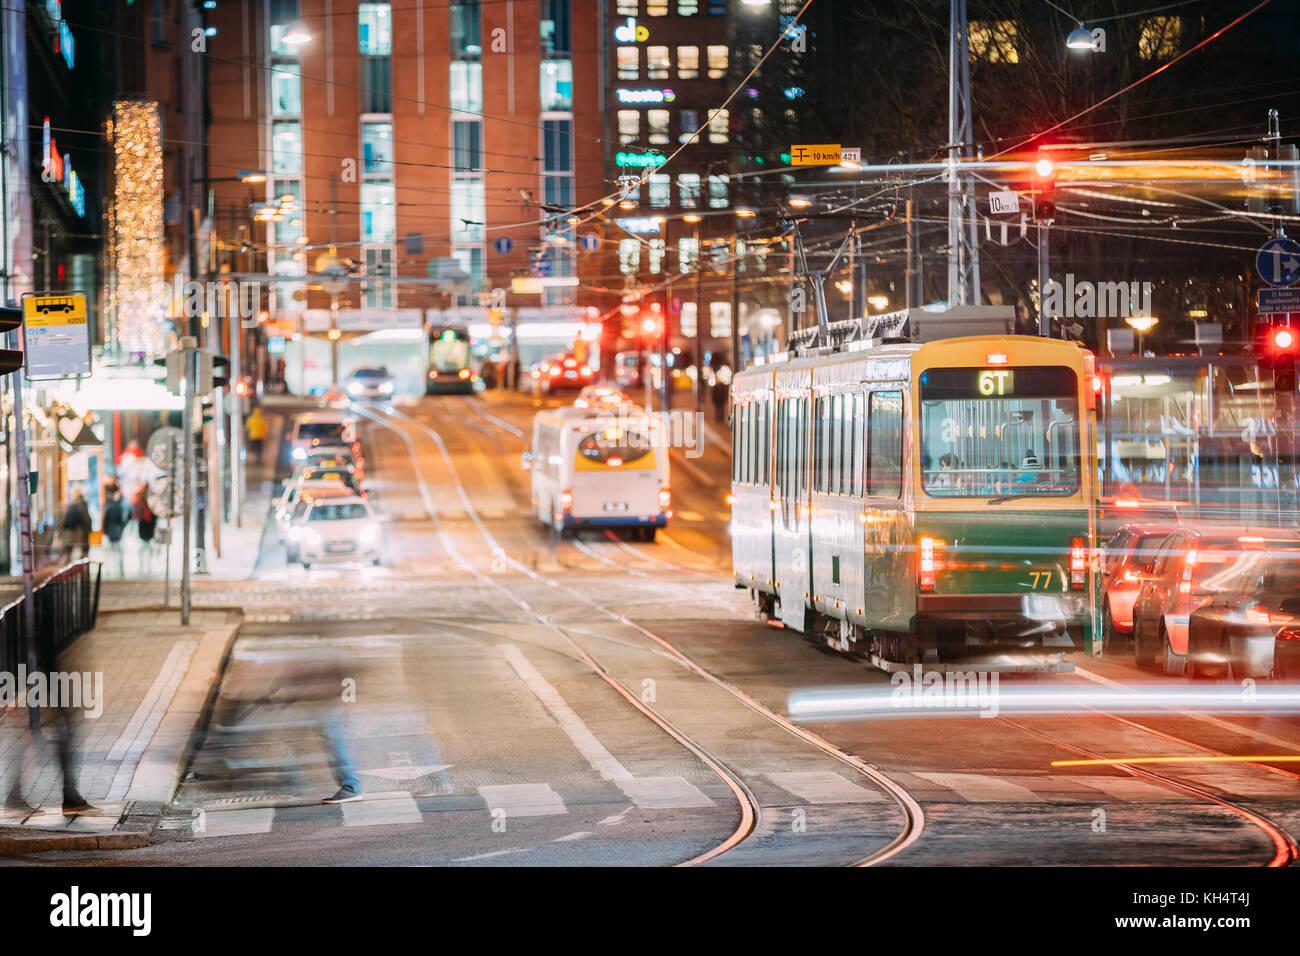 Helsinki, Finland. Tram Departs From A Stop On Kaivokatu Street In Helsinki. Night View Of Kaivokatu Street In Kluuvi - Stock Image